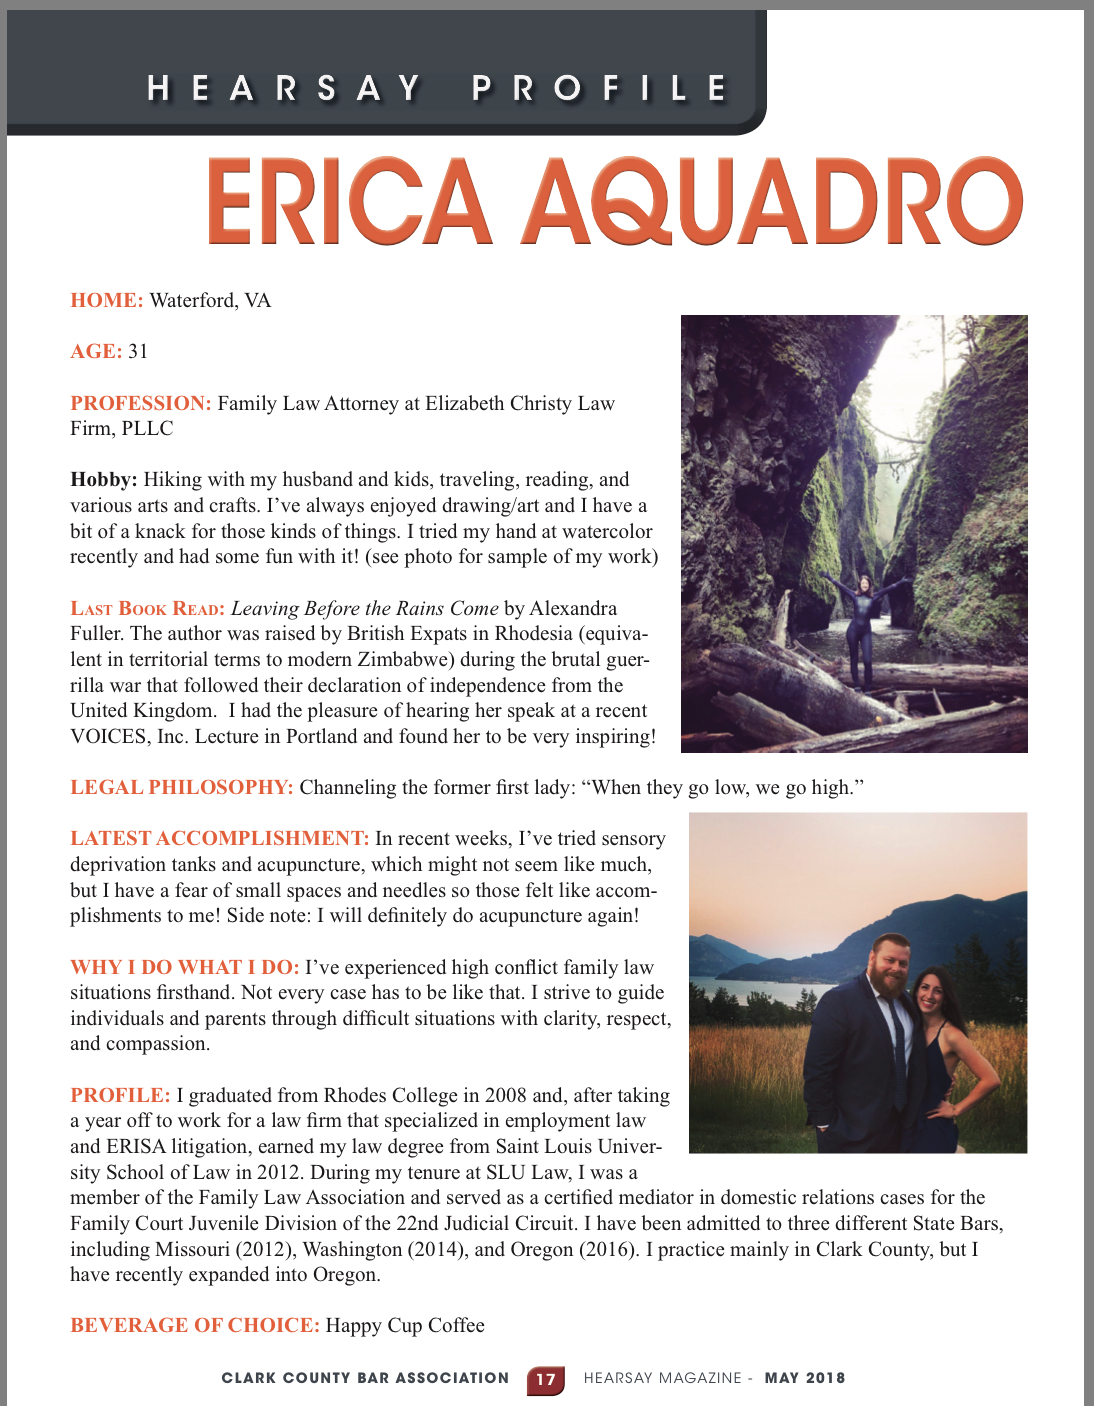 Erica Aquadro, Hearsay Magazine